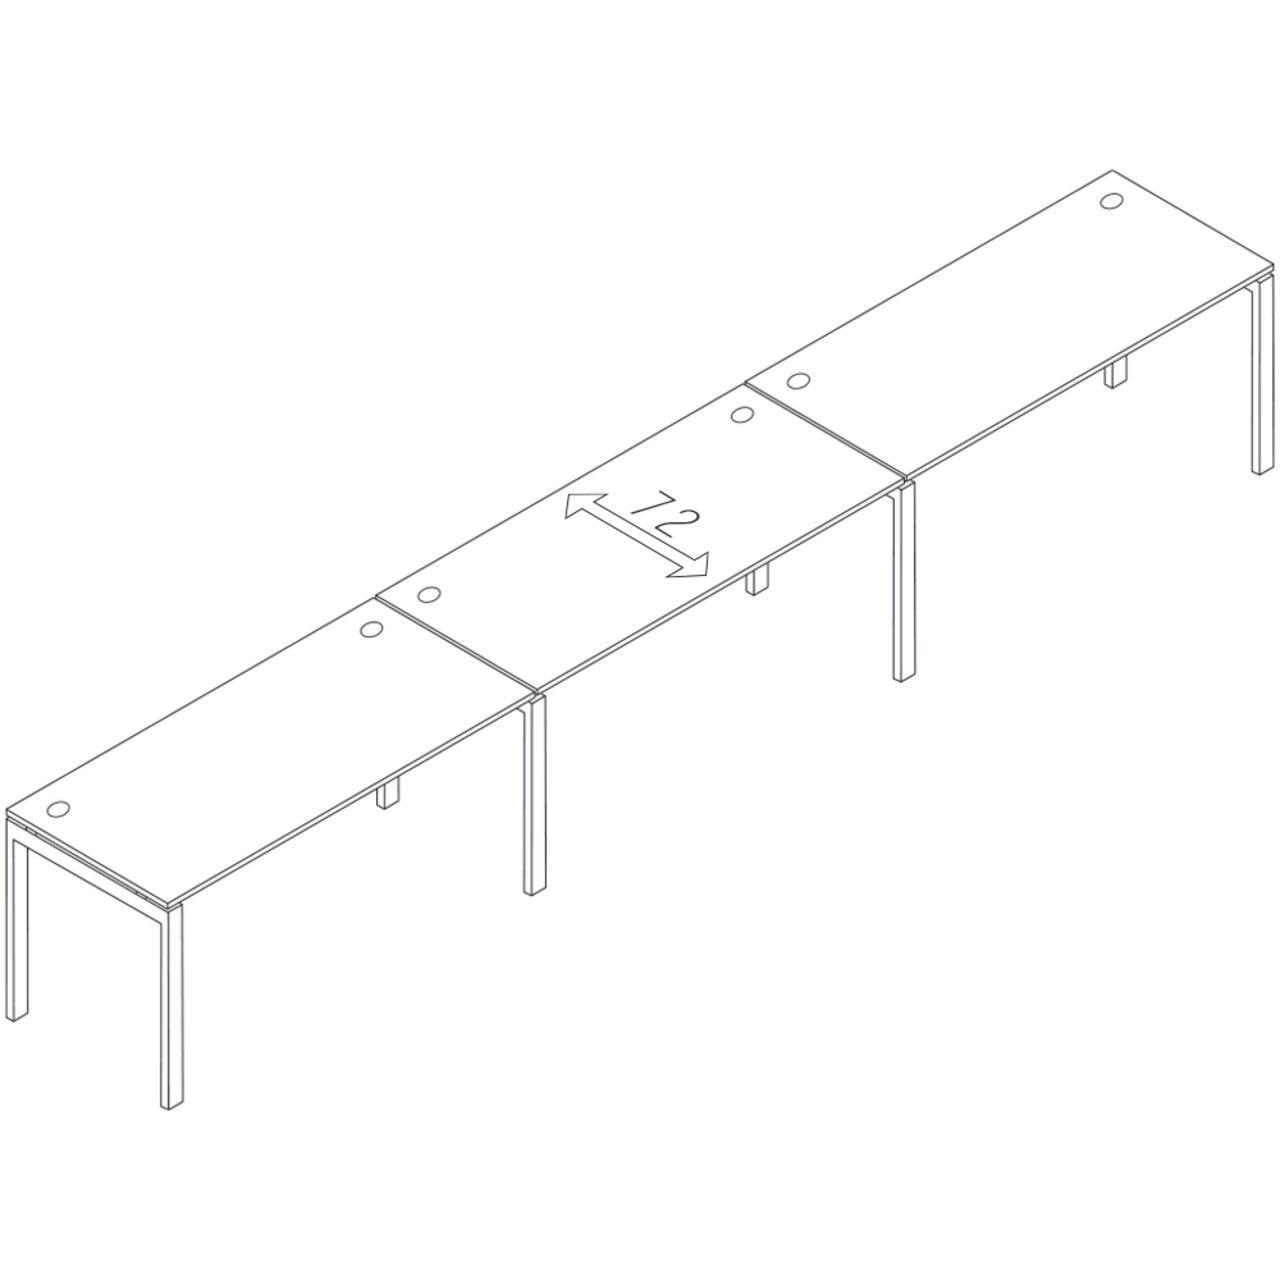 Бенч-система на 3 места линейная  TREND 360x72x75 - фото 1